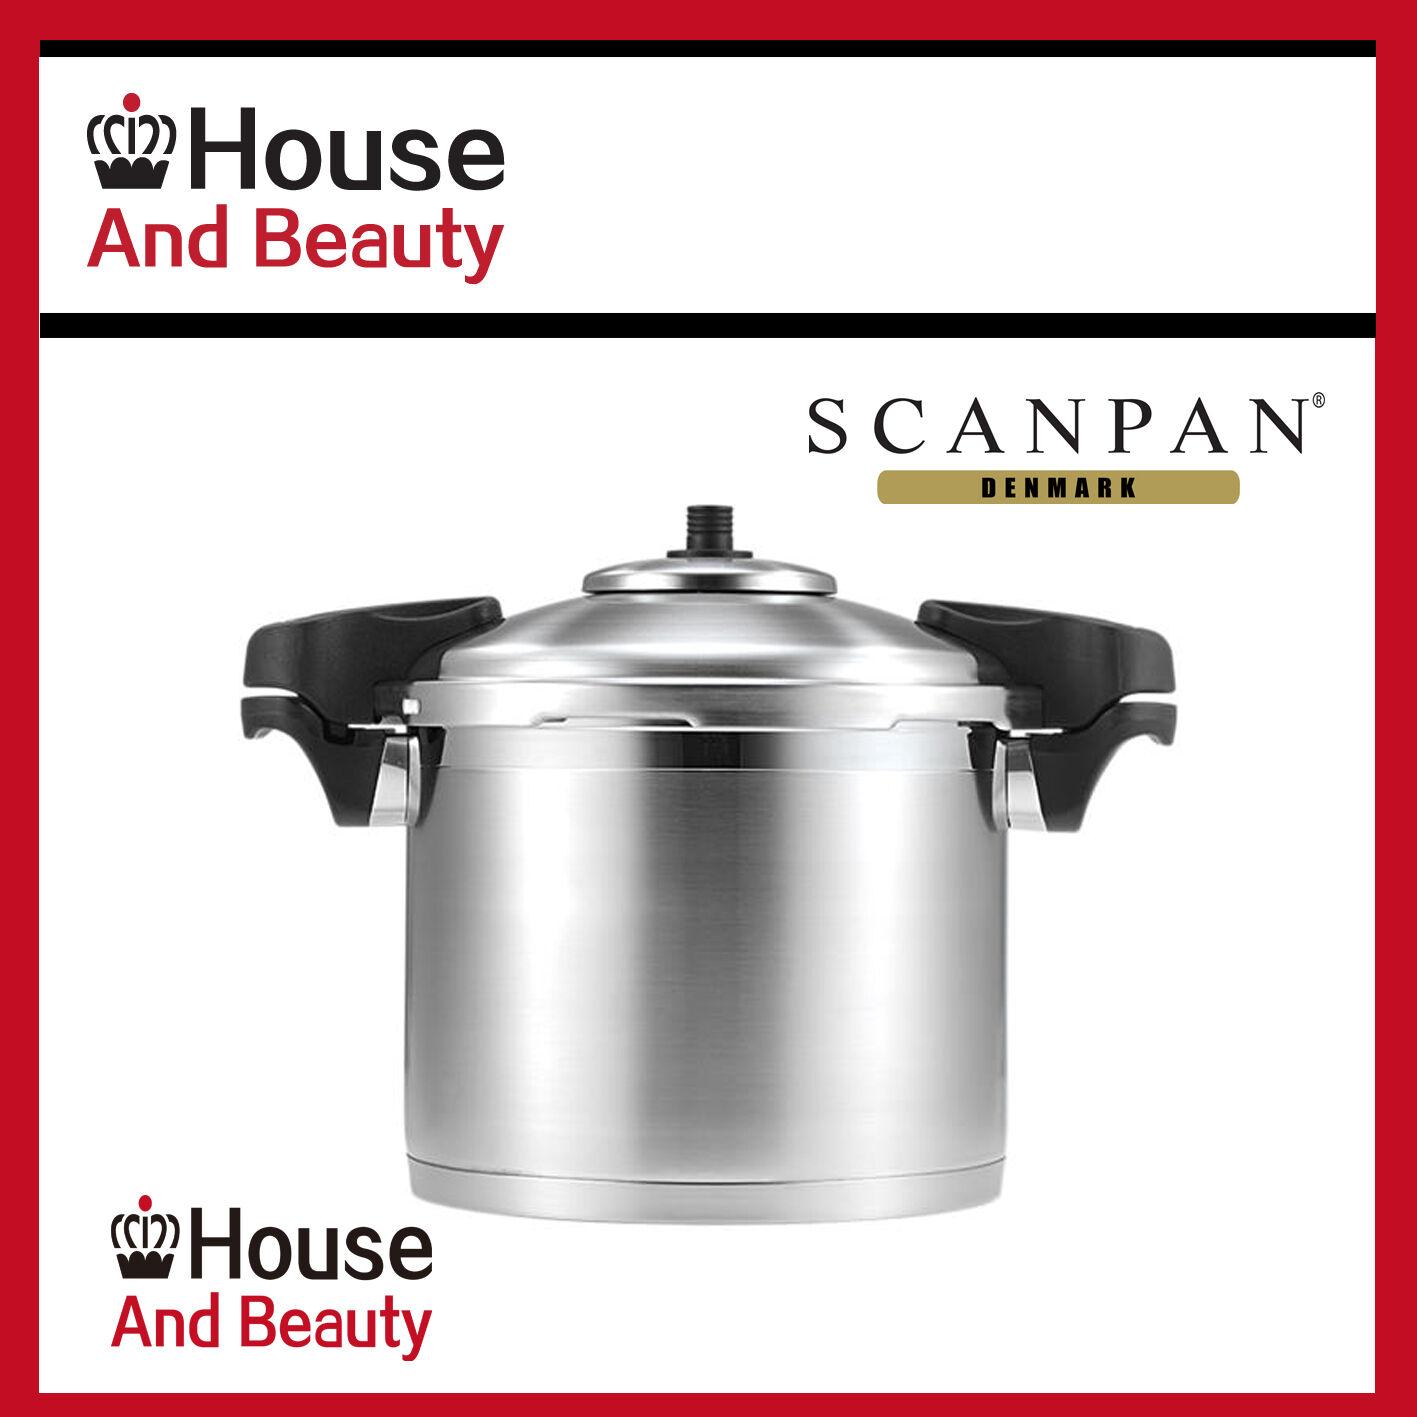 NEW Scanpan S Steel Pressure Cooker W Side Handles 24cm 8L (  419)